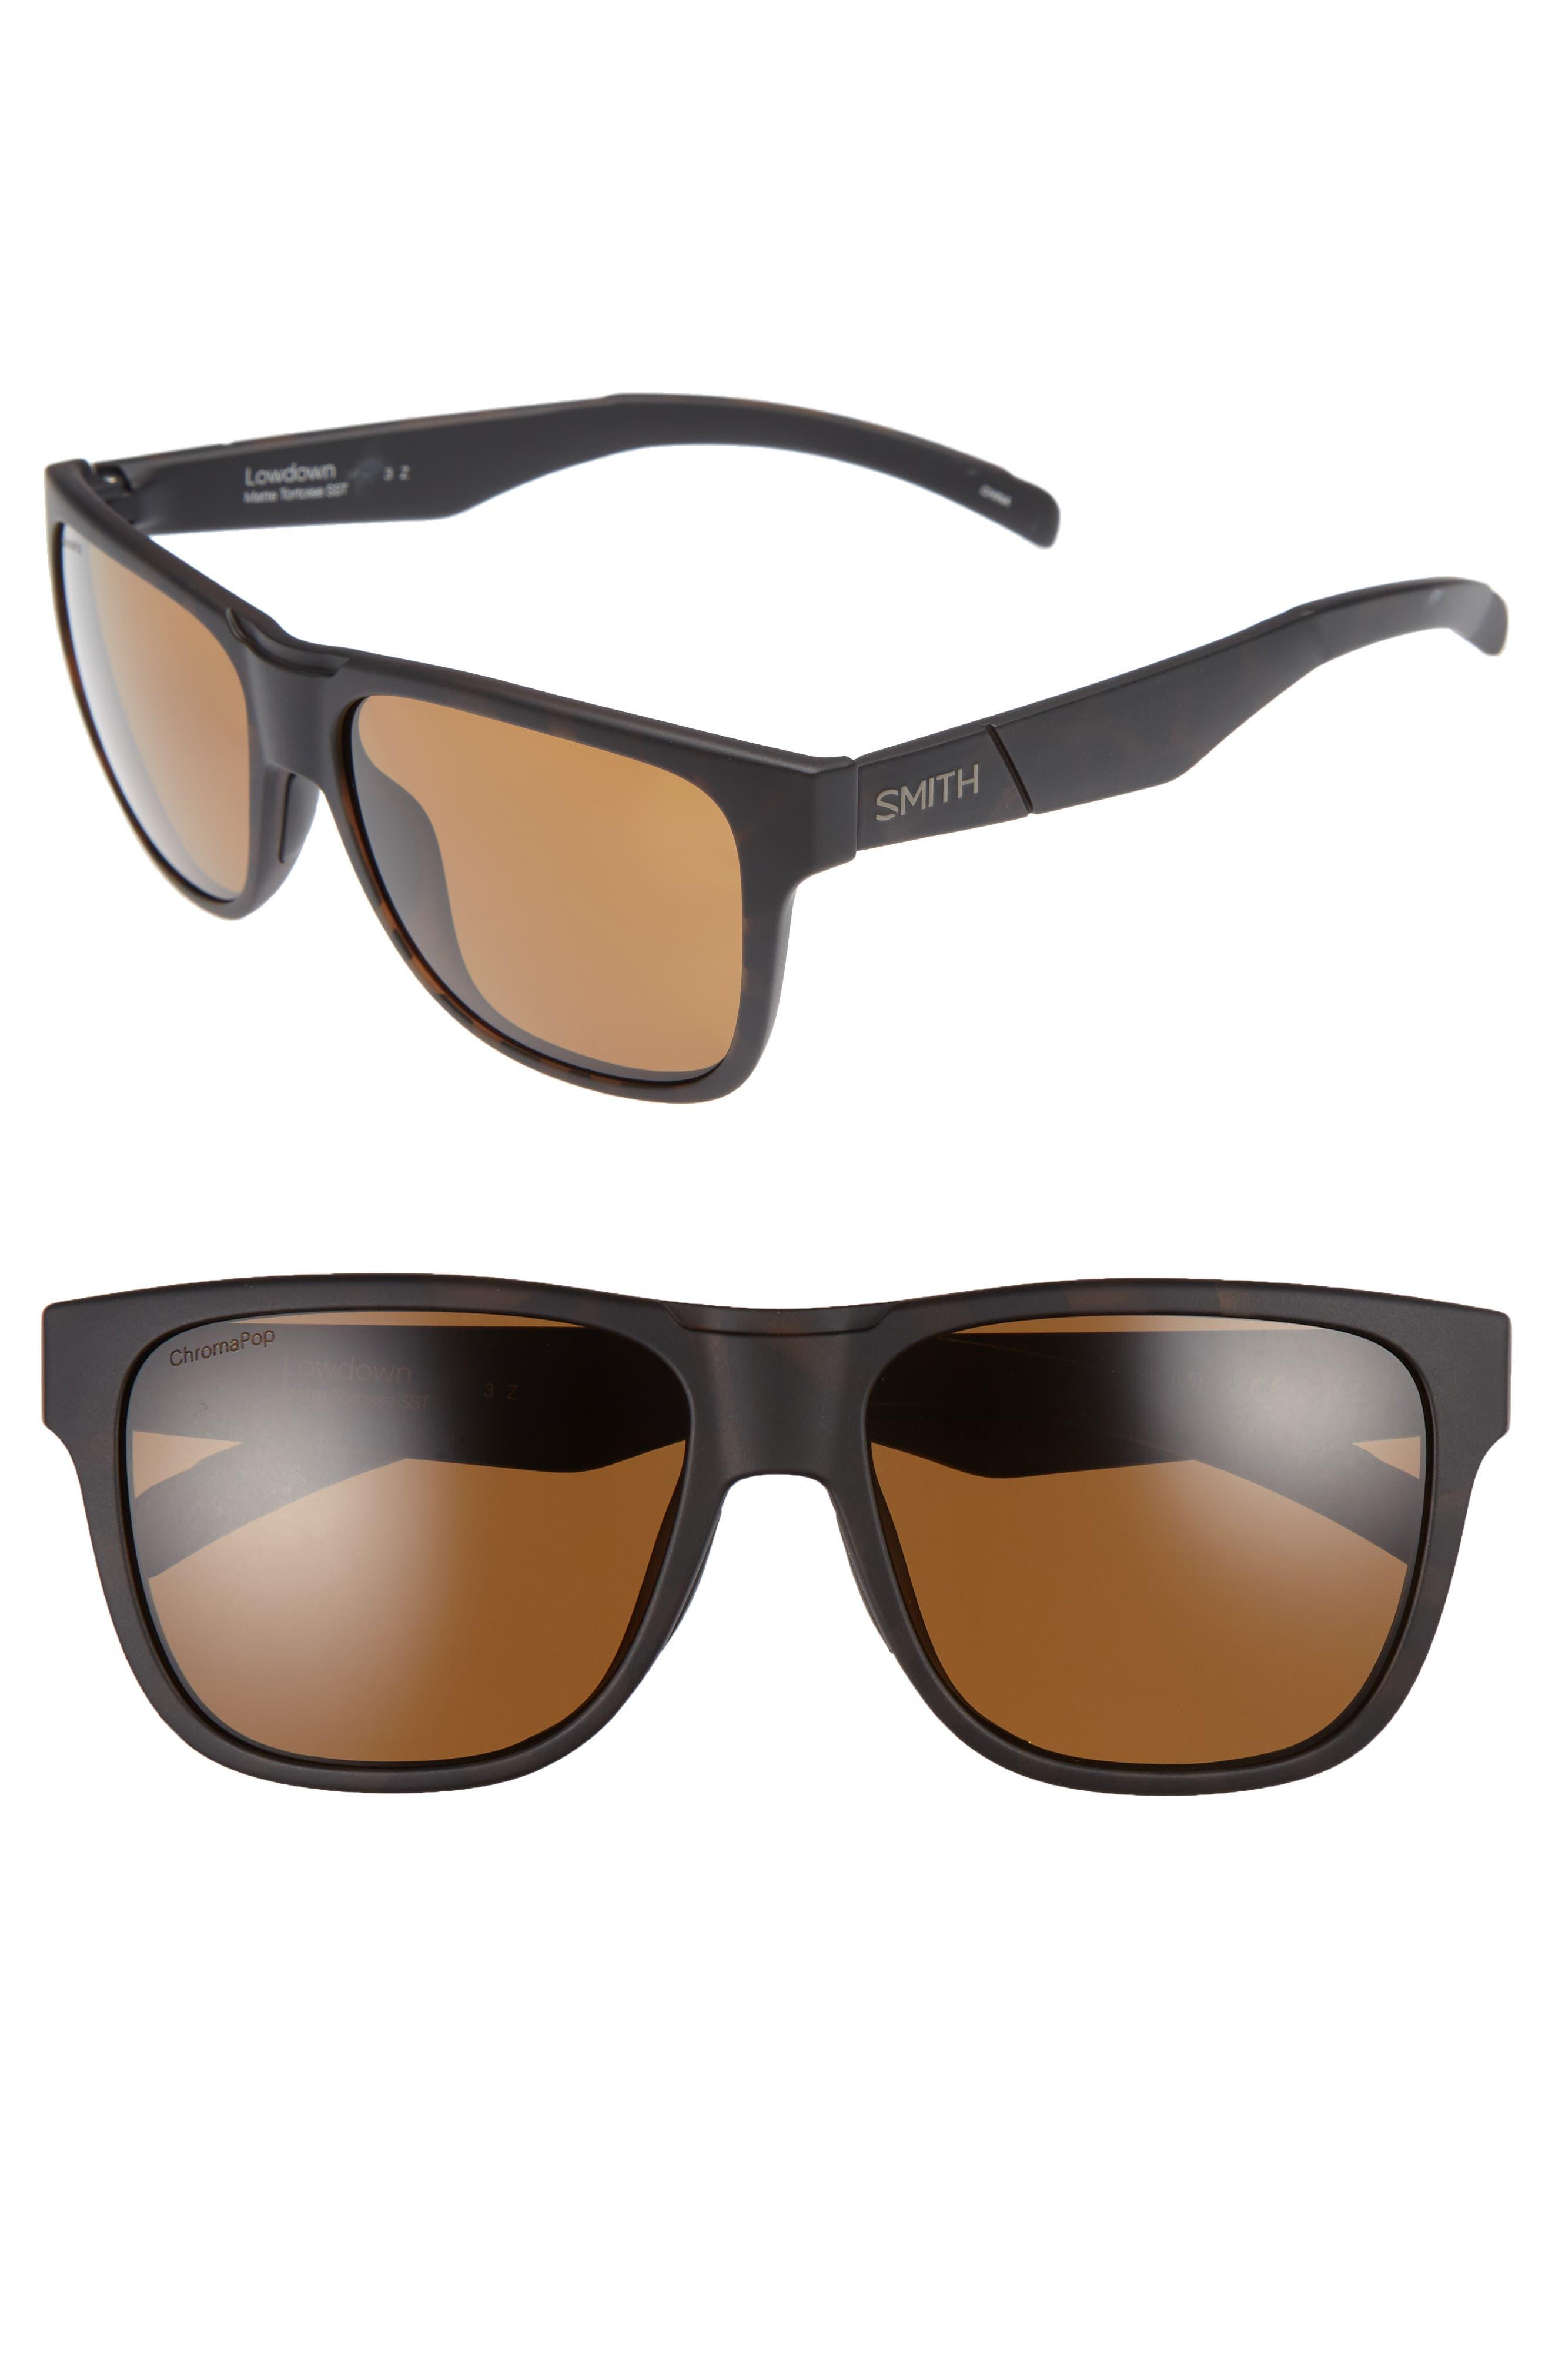 Lowdown 56mm Polarized Sunglasses,                             Main thumbnail 1, color,                             200